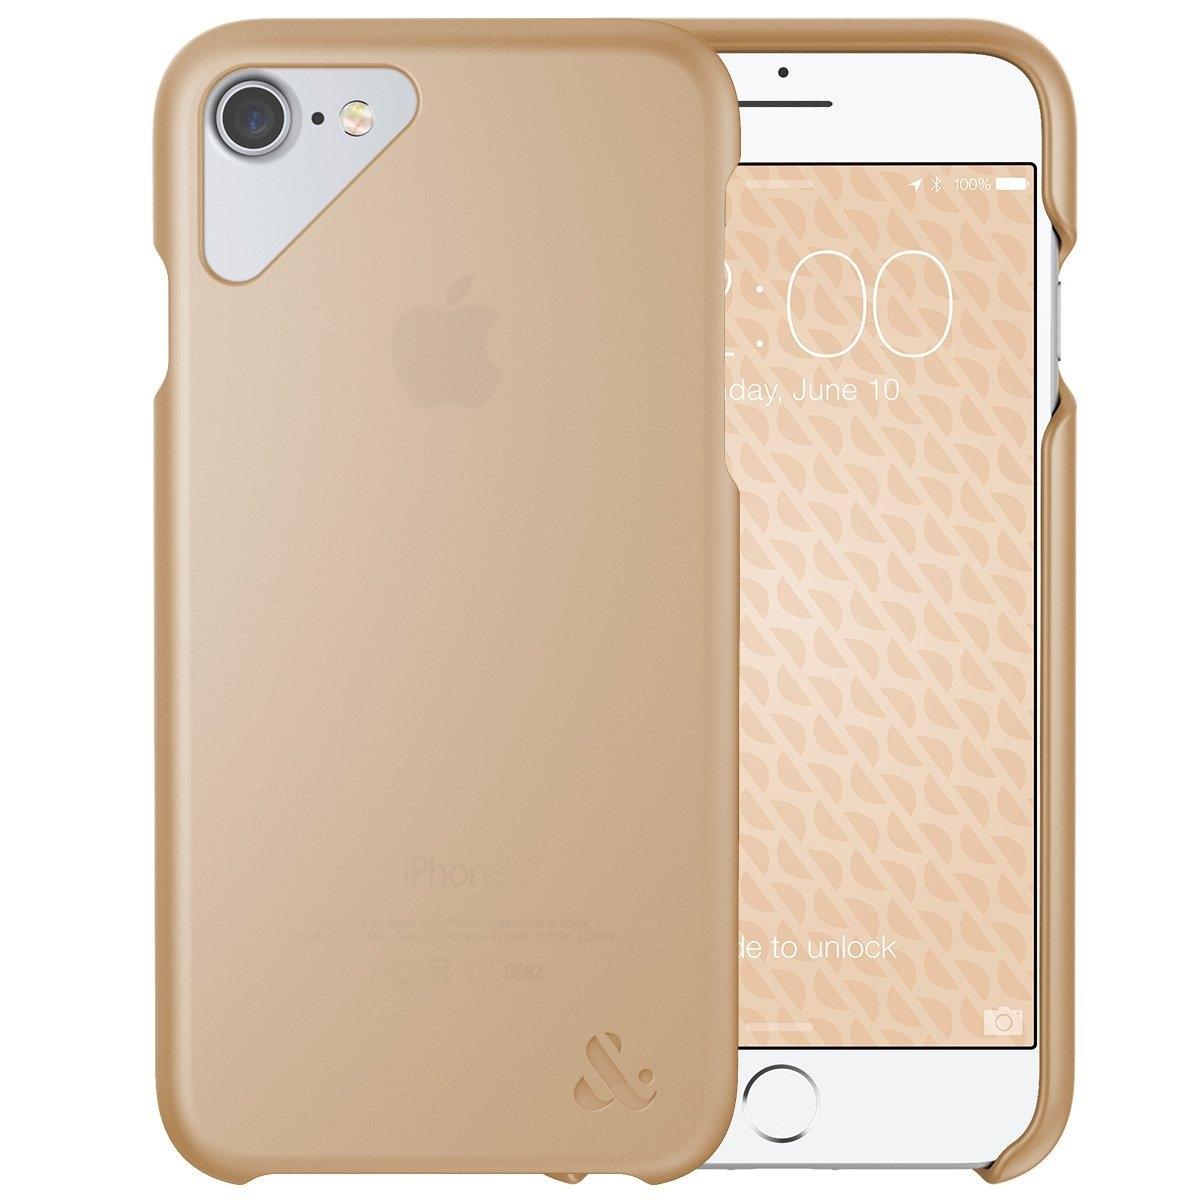 Amber And Ash Apple iPhone 7 FW Seri Kılıf